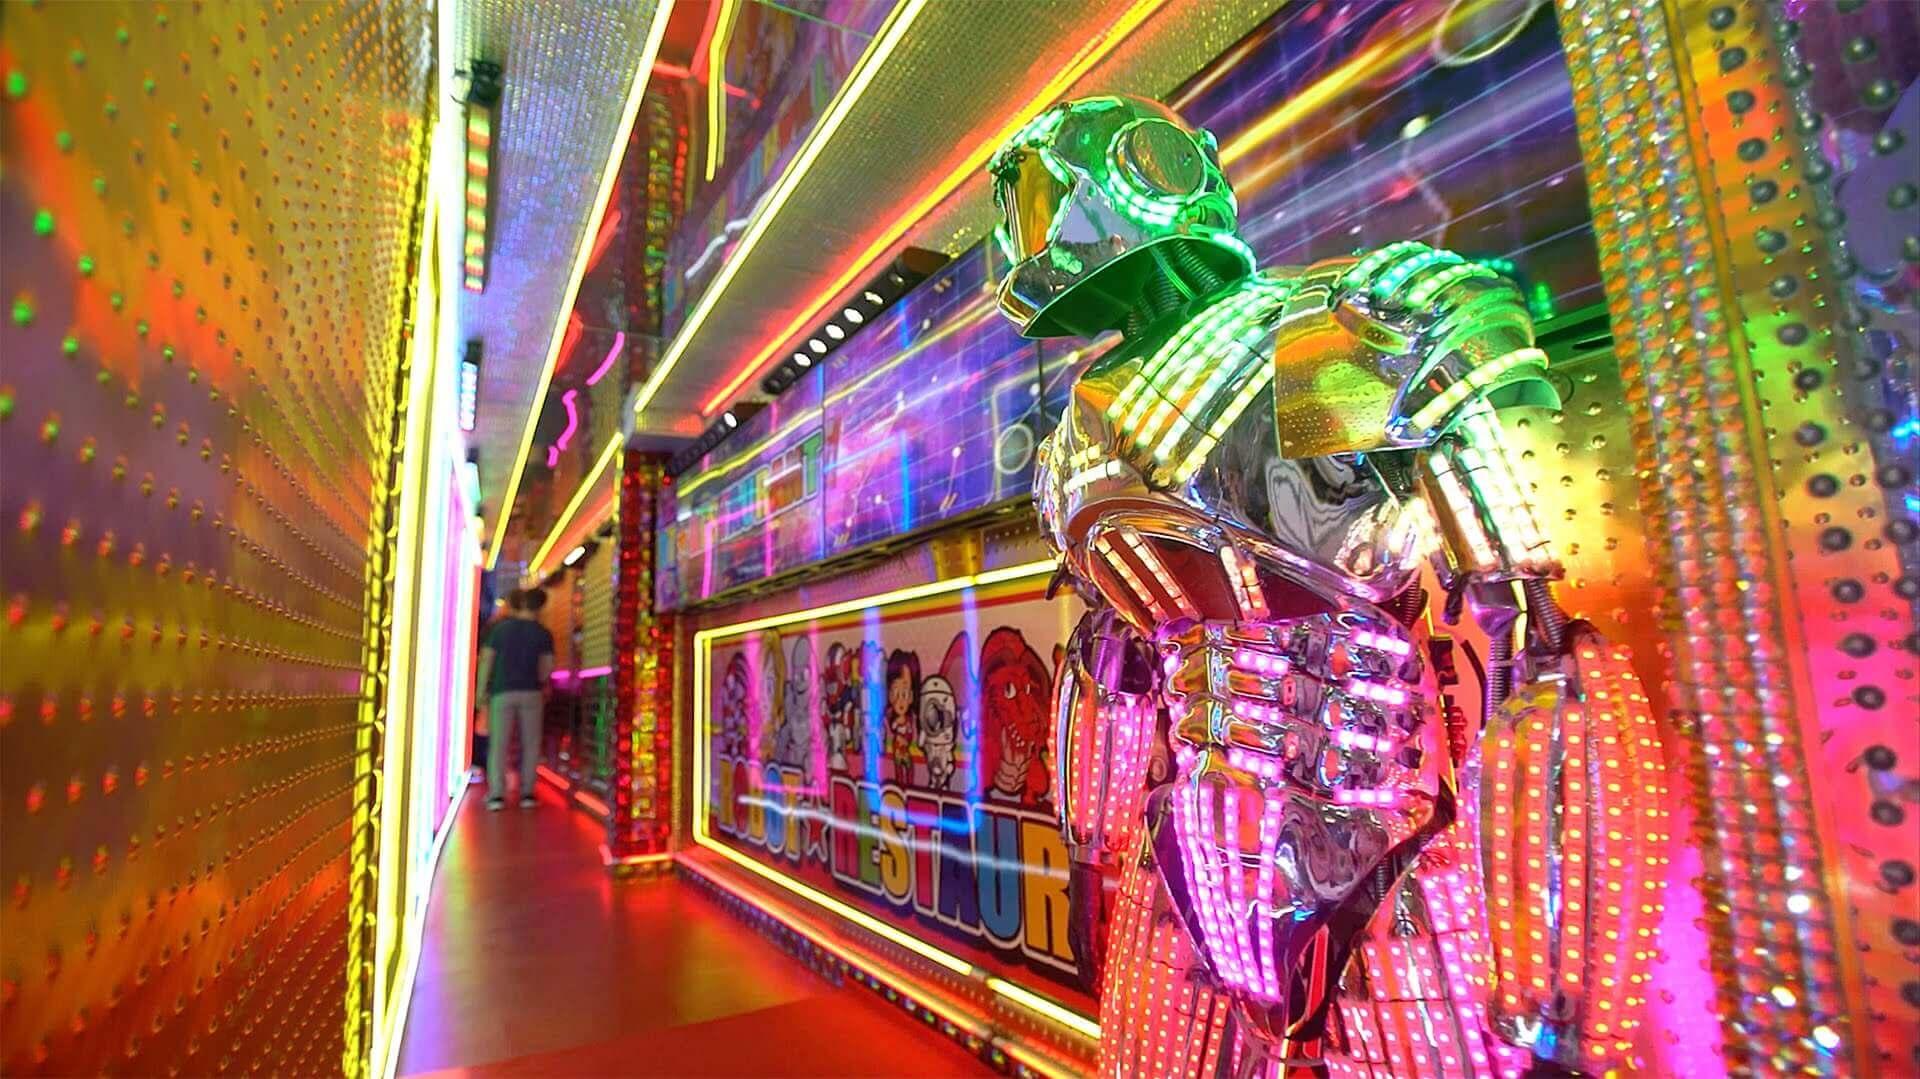 Tokyo Robot Restaurant Ticket